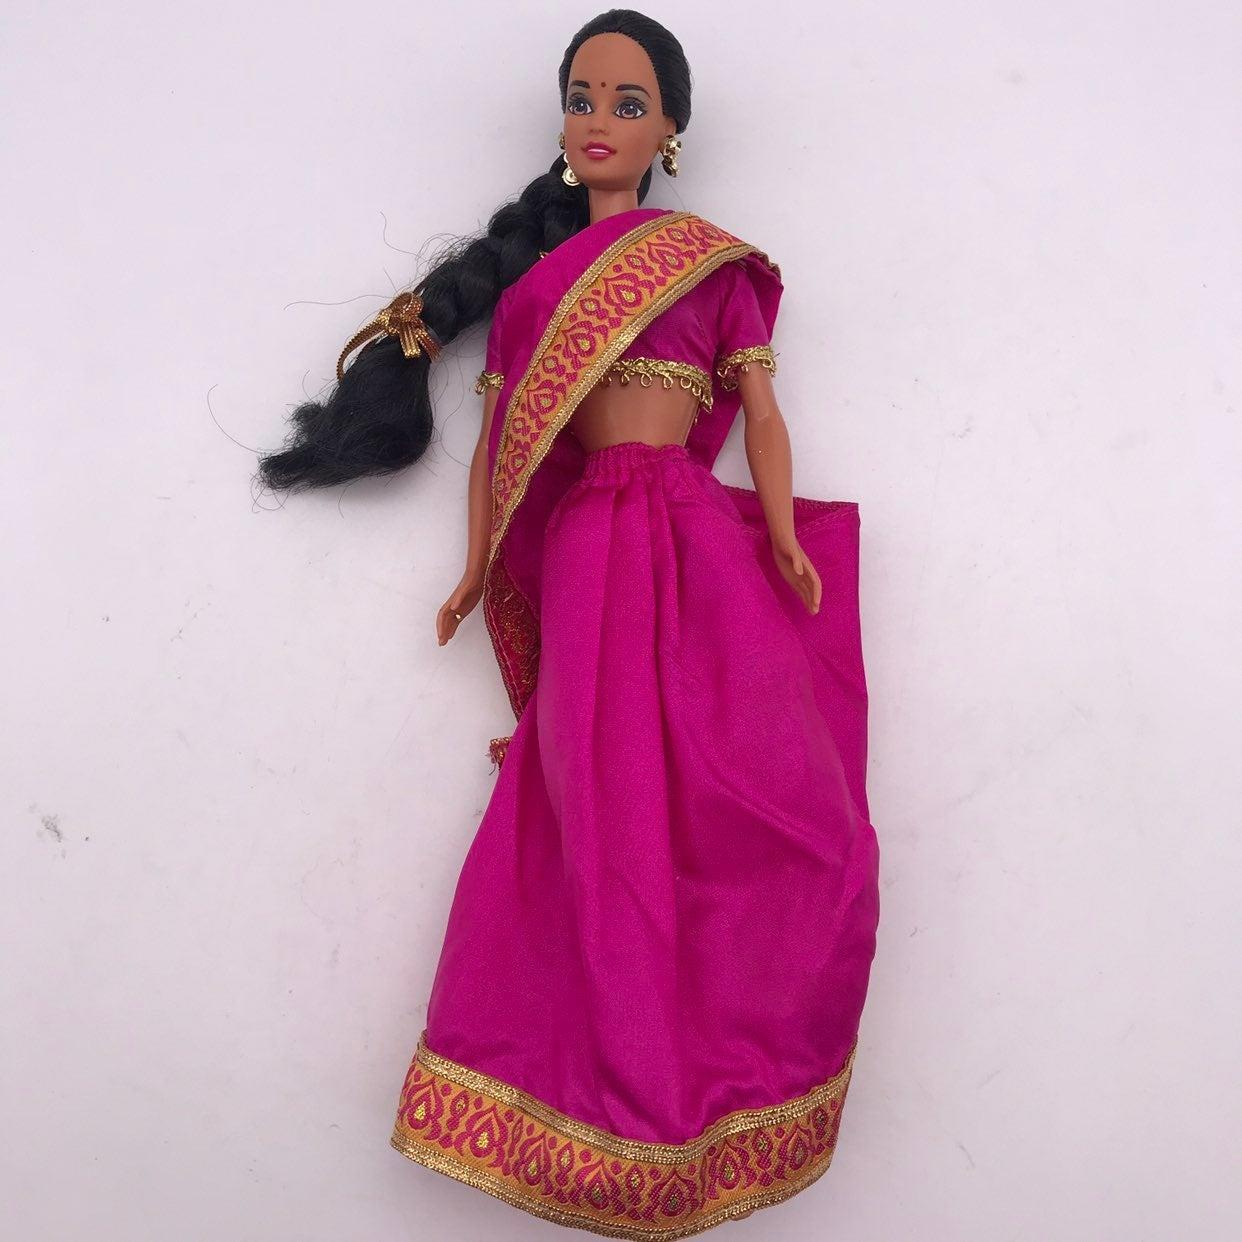 Vintage Barbie Indian Doll